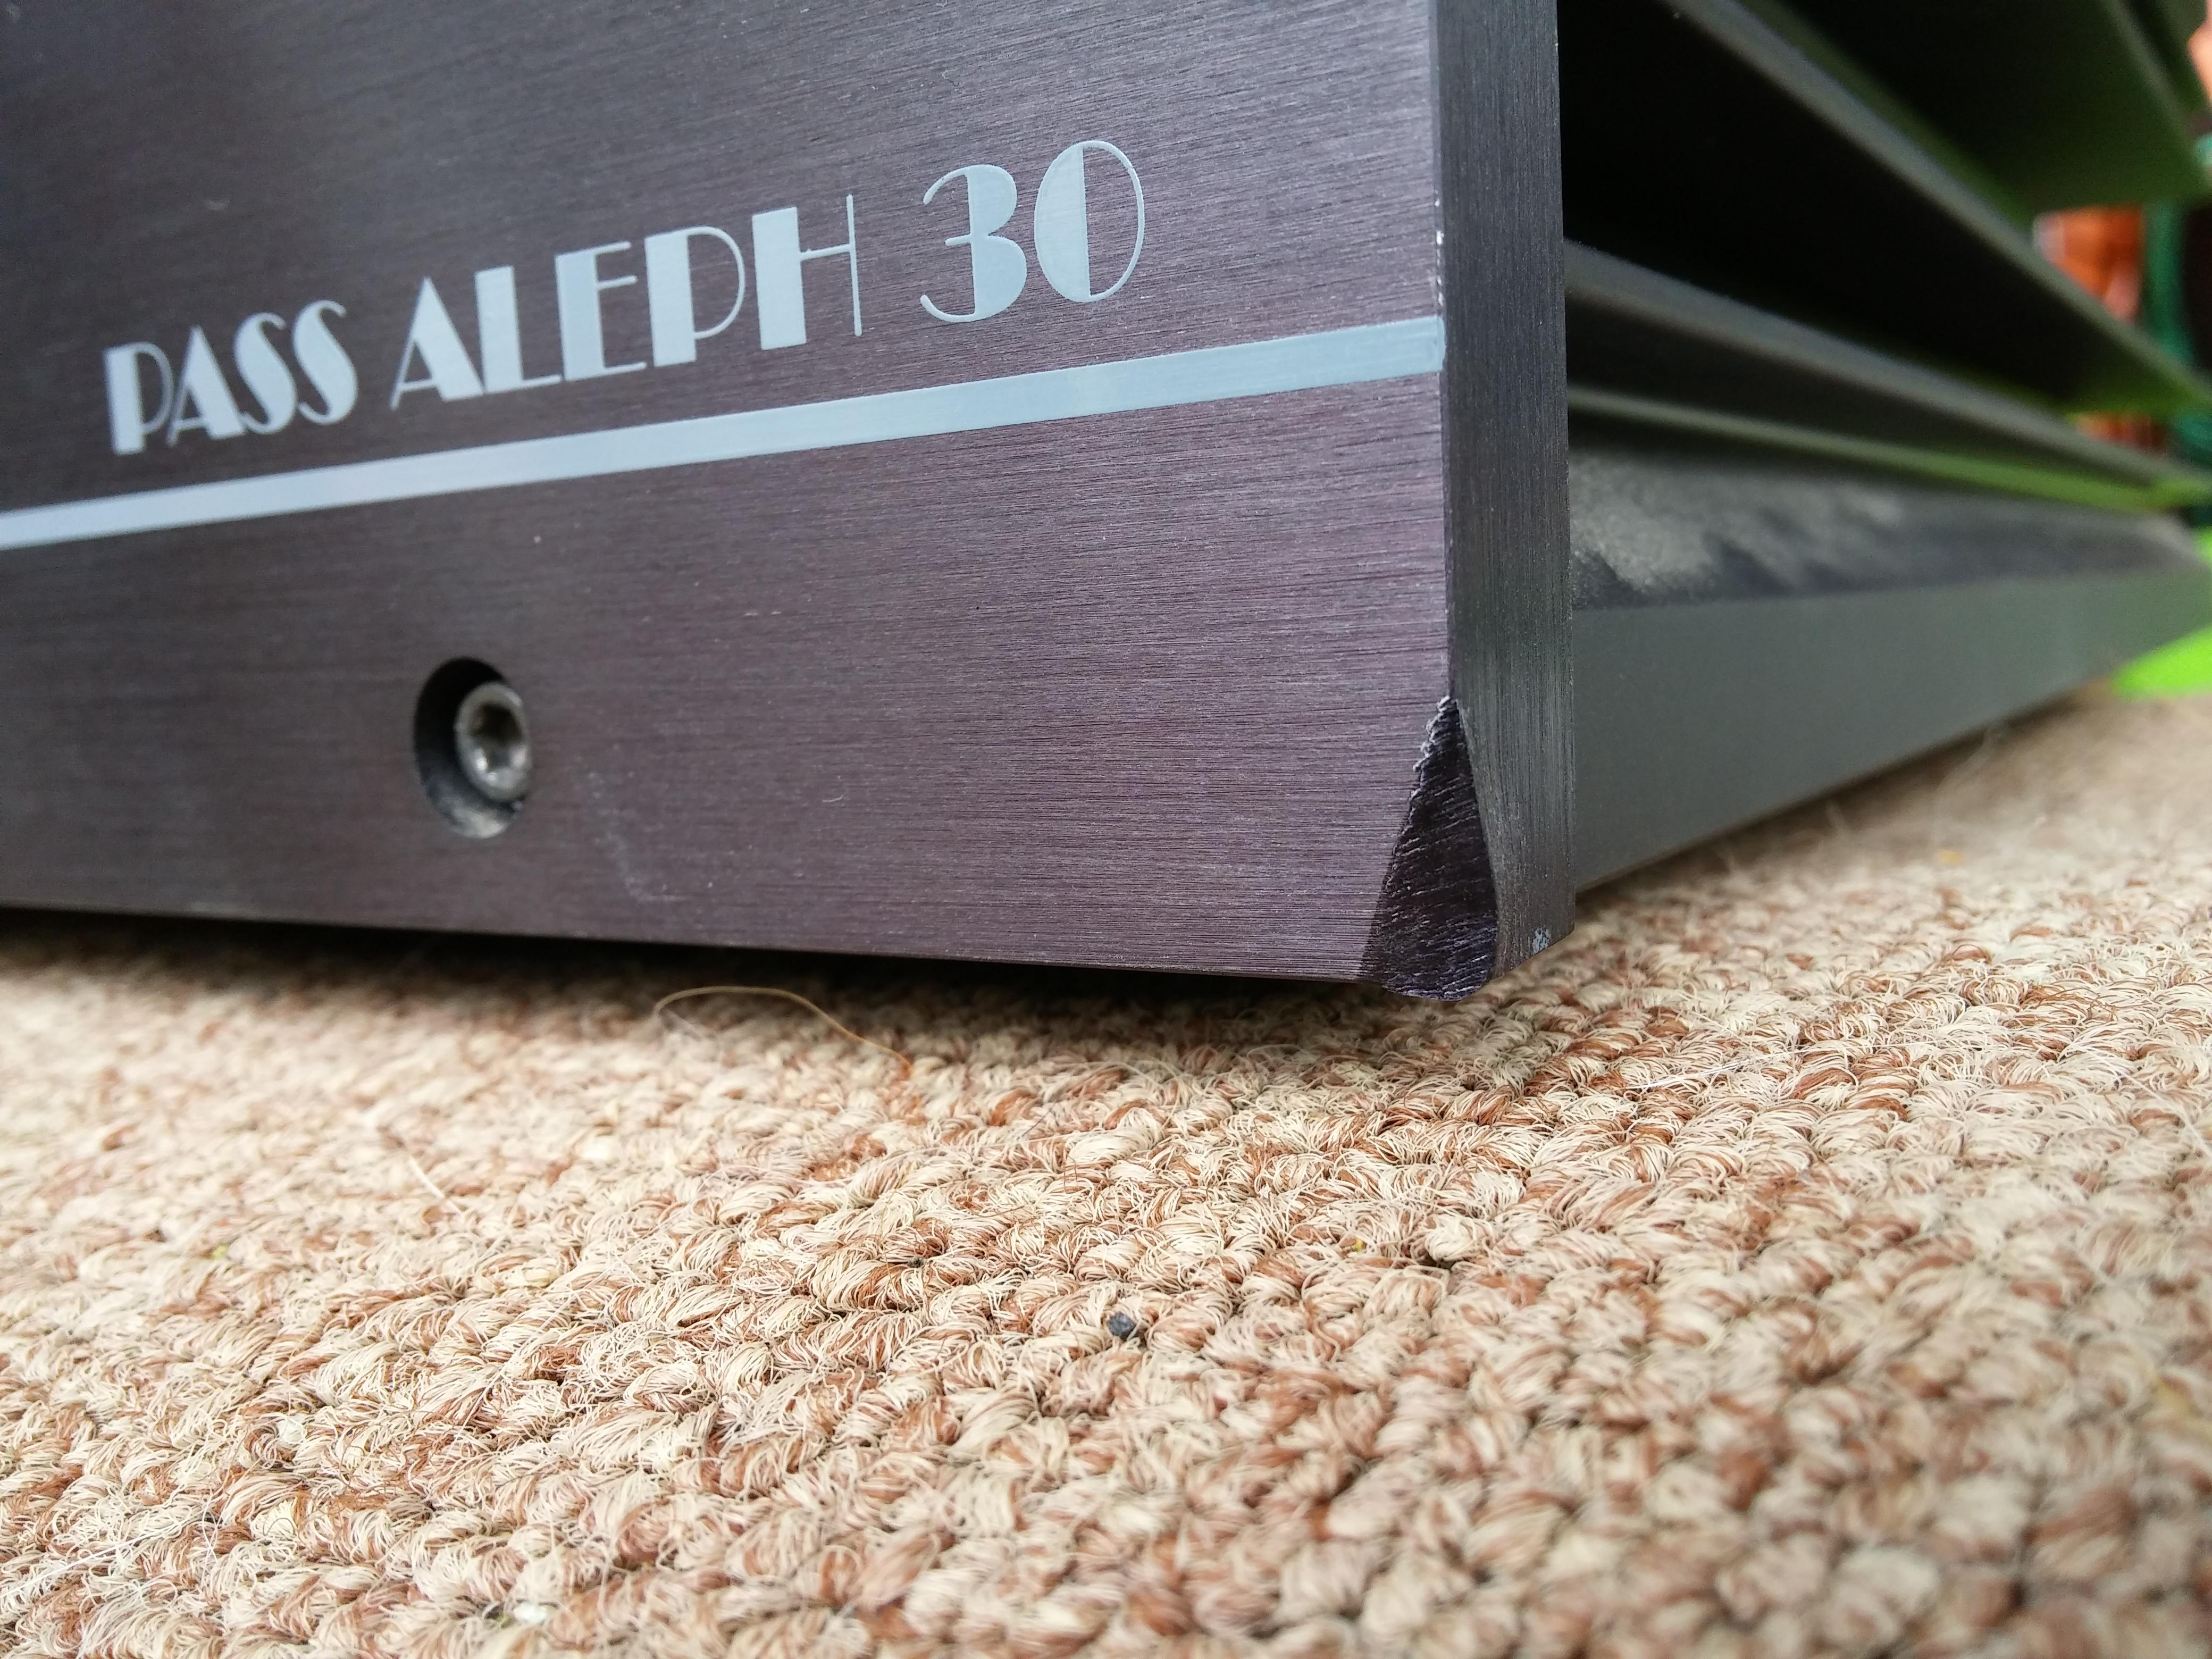 Pass Labs Aleph 30 power amplifier — Polk Audio